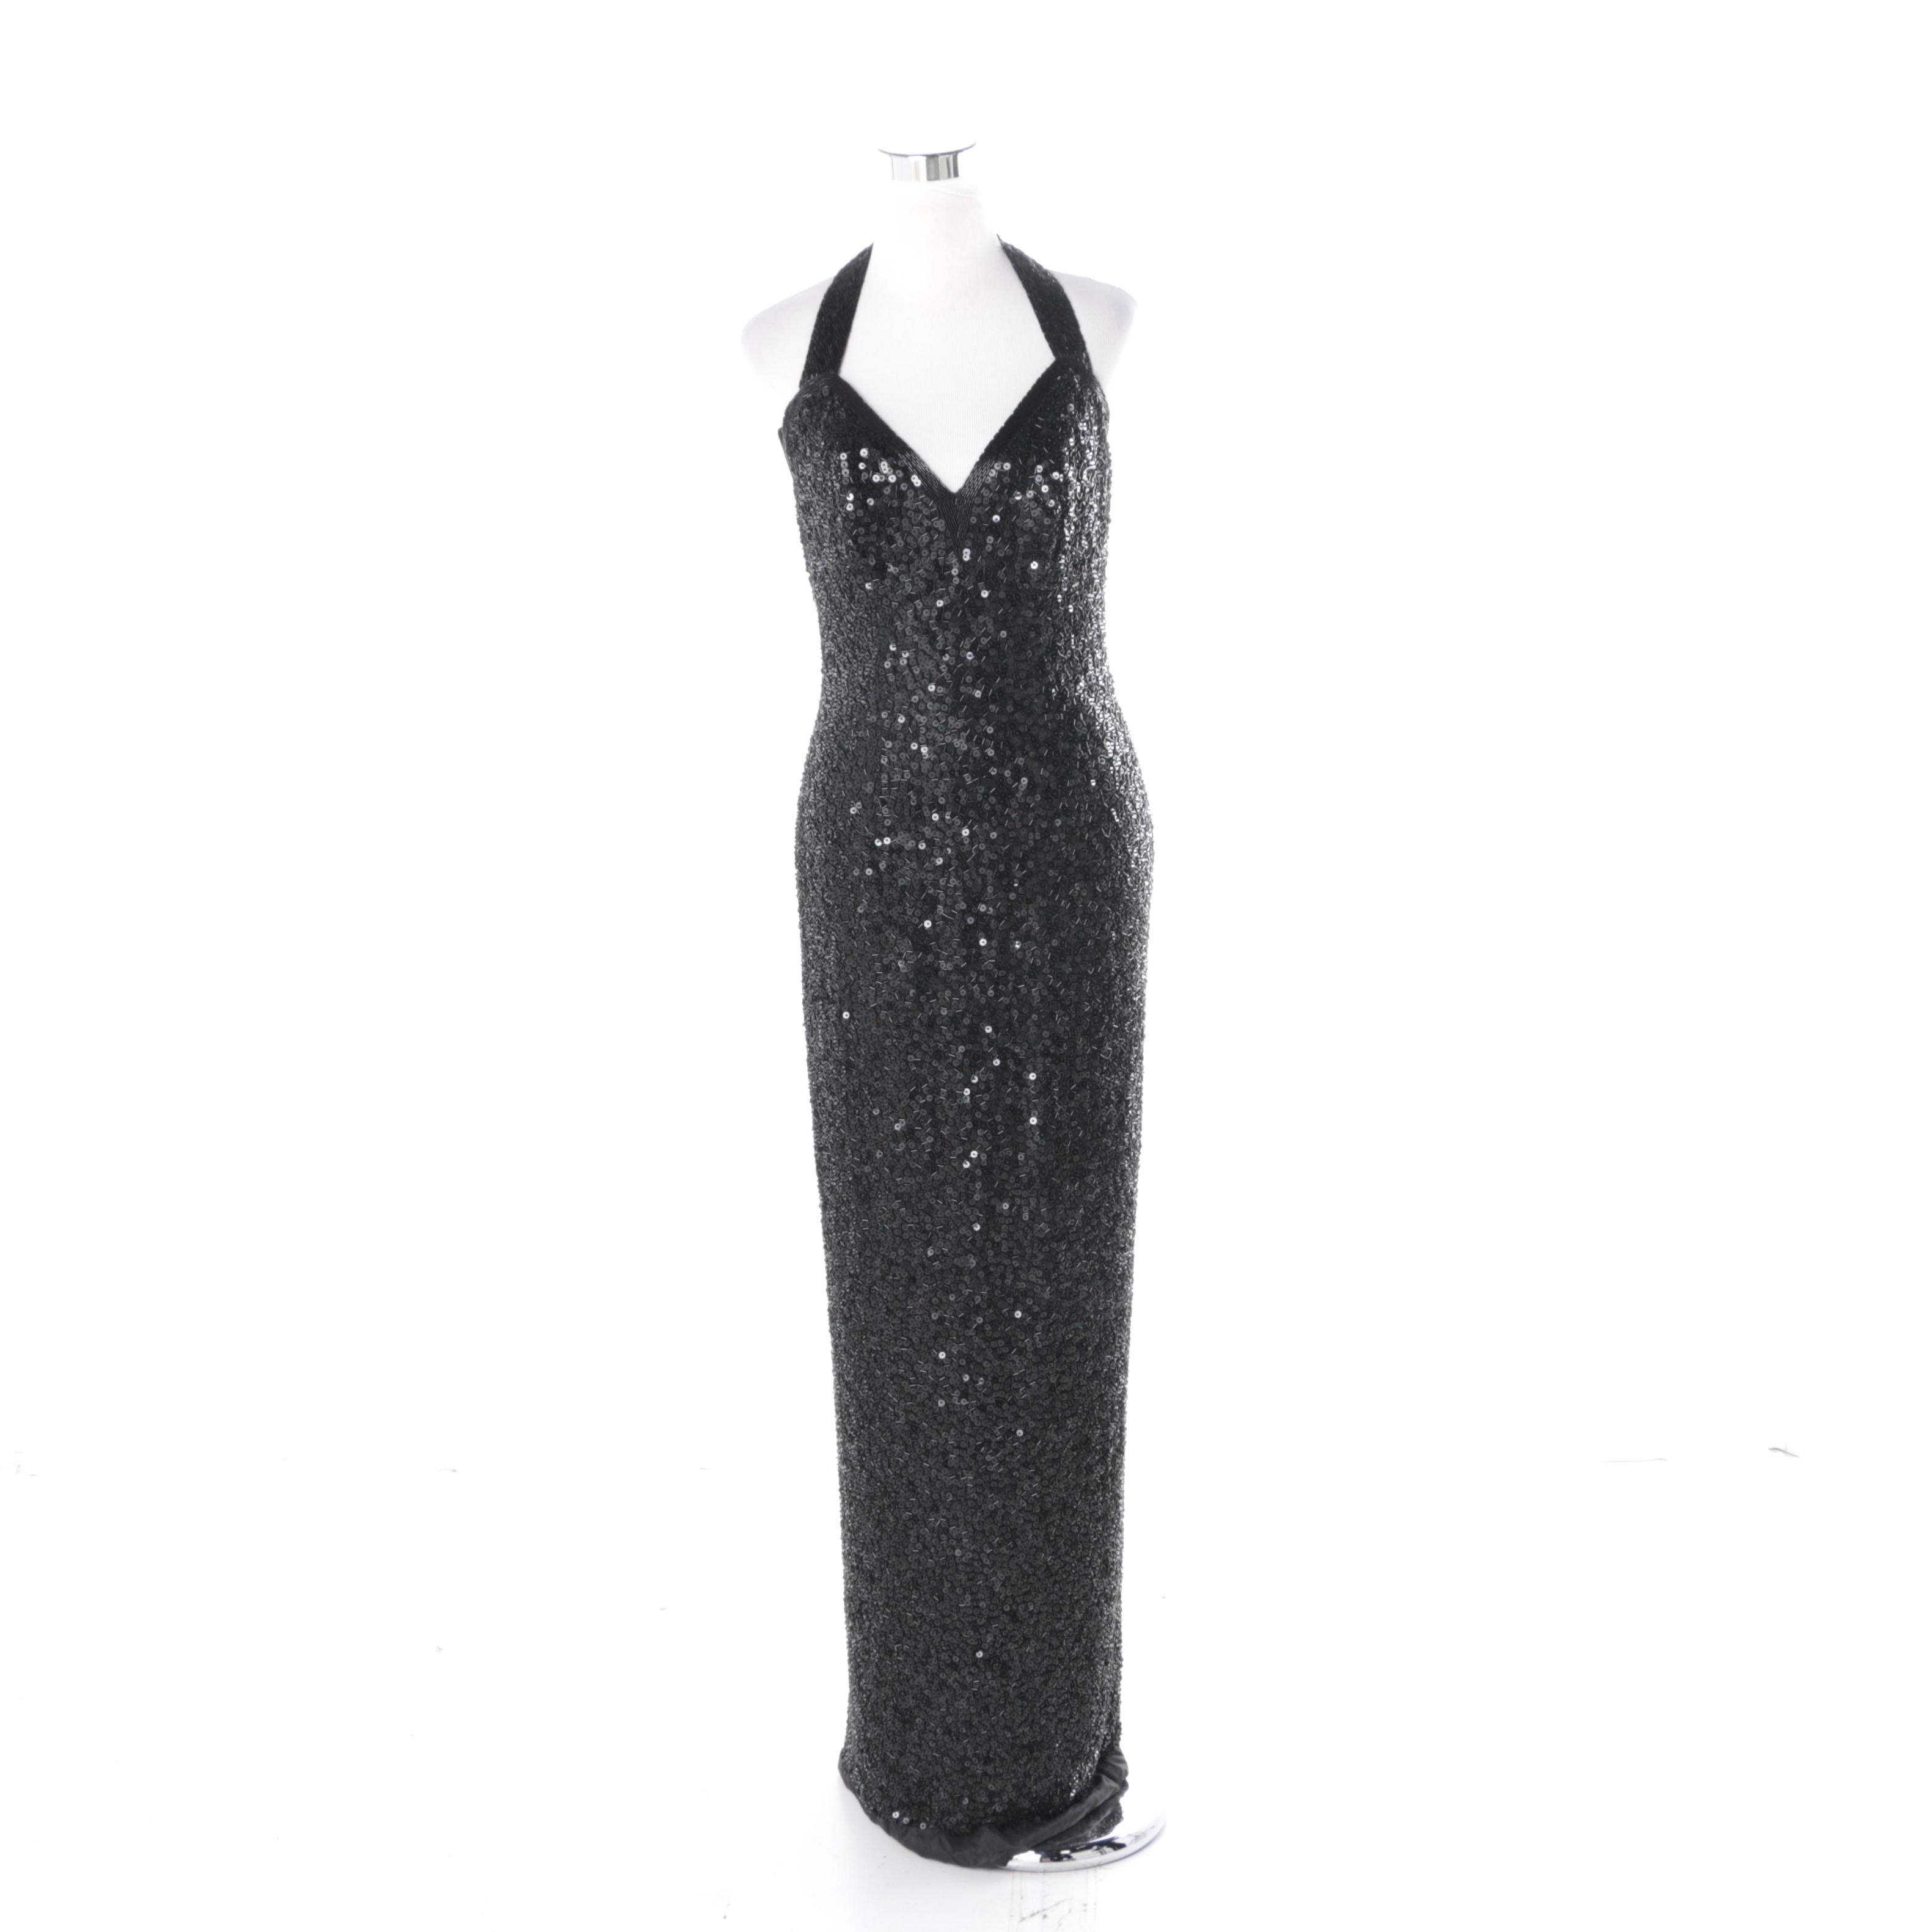 Stephen Yearick for Lillie Rubin Hand Beaded Silk Evening Gown